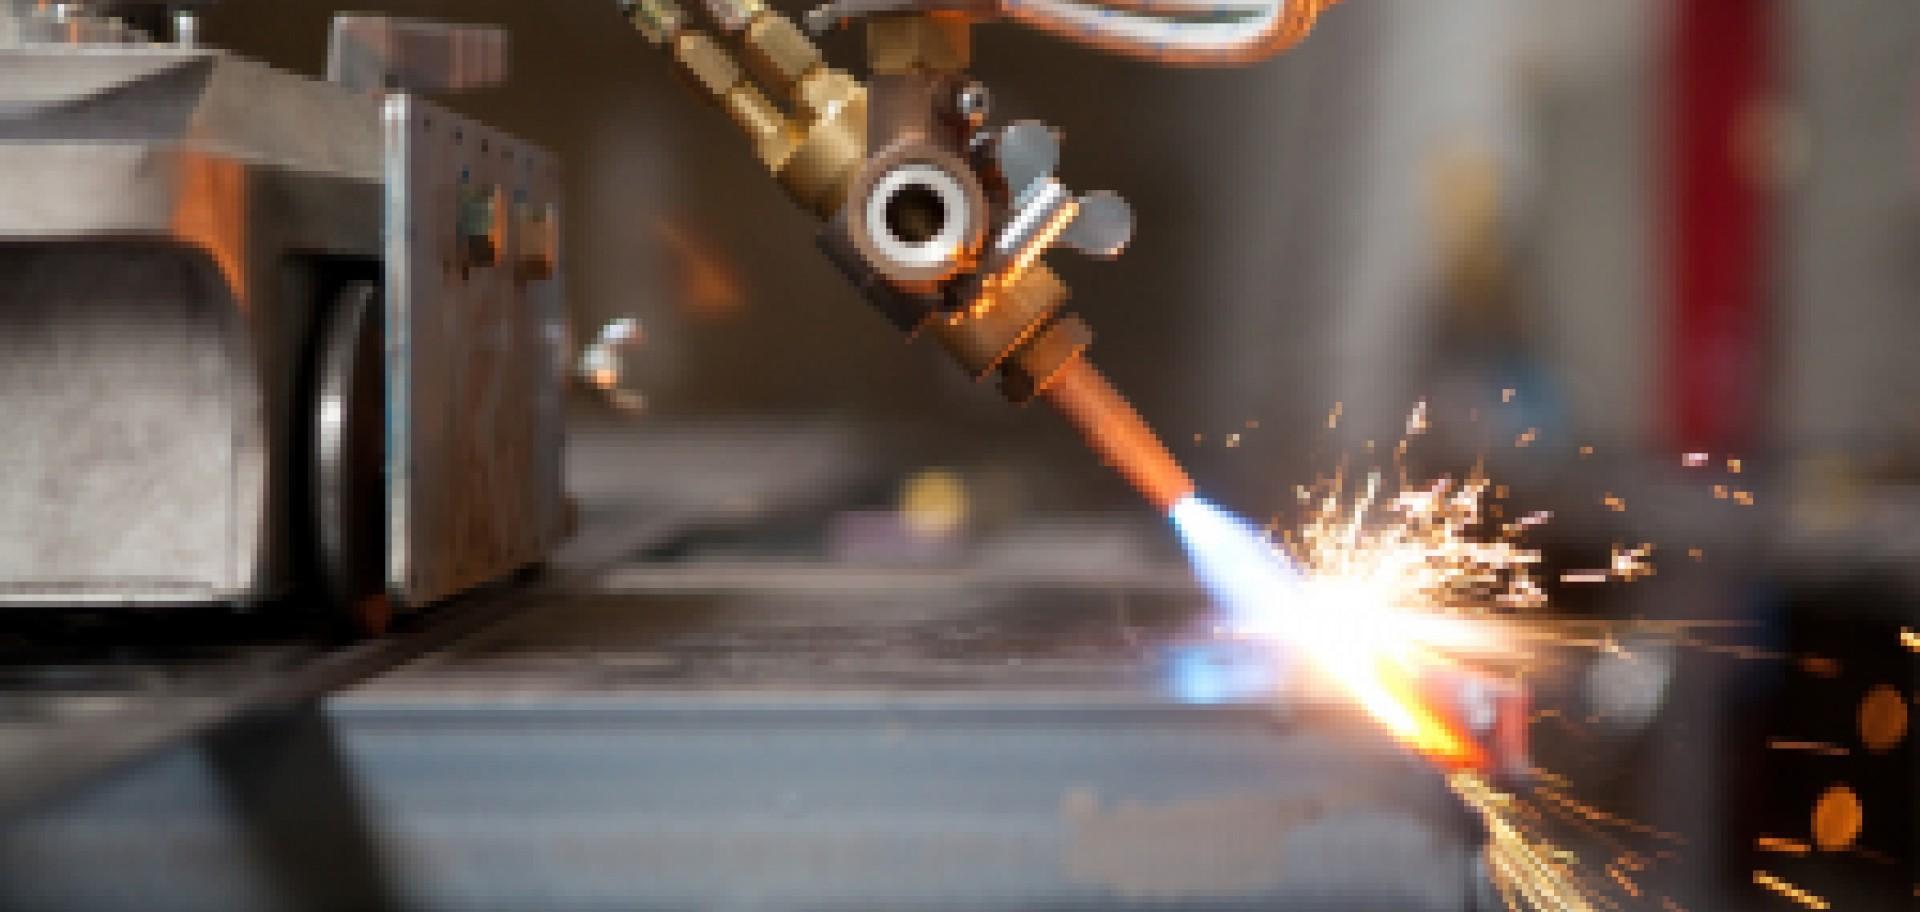 Steel Solutions International neemt nieuwe afschuinmachine in gebruik